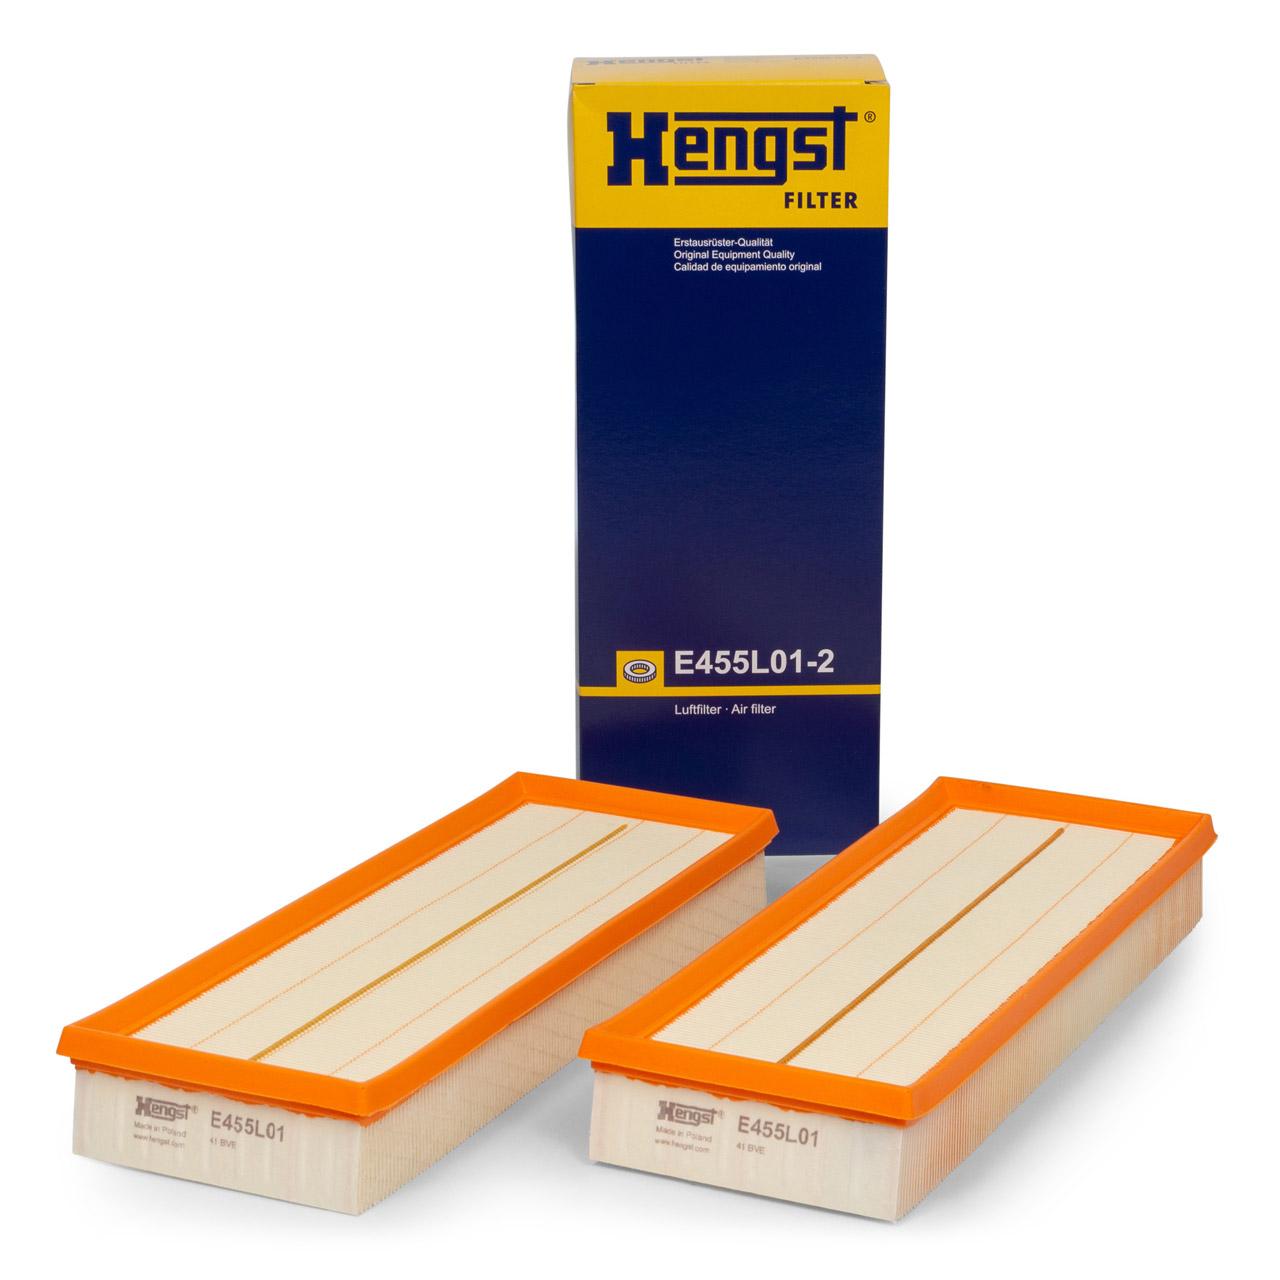 HENGST E455L012 Luftfilter Satz MERCEDES W203 W204 W211 W212 W220 M112 M113 M272